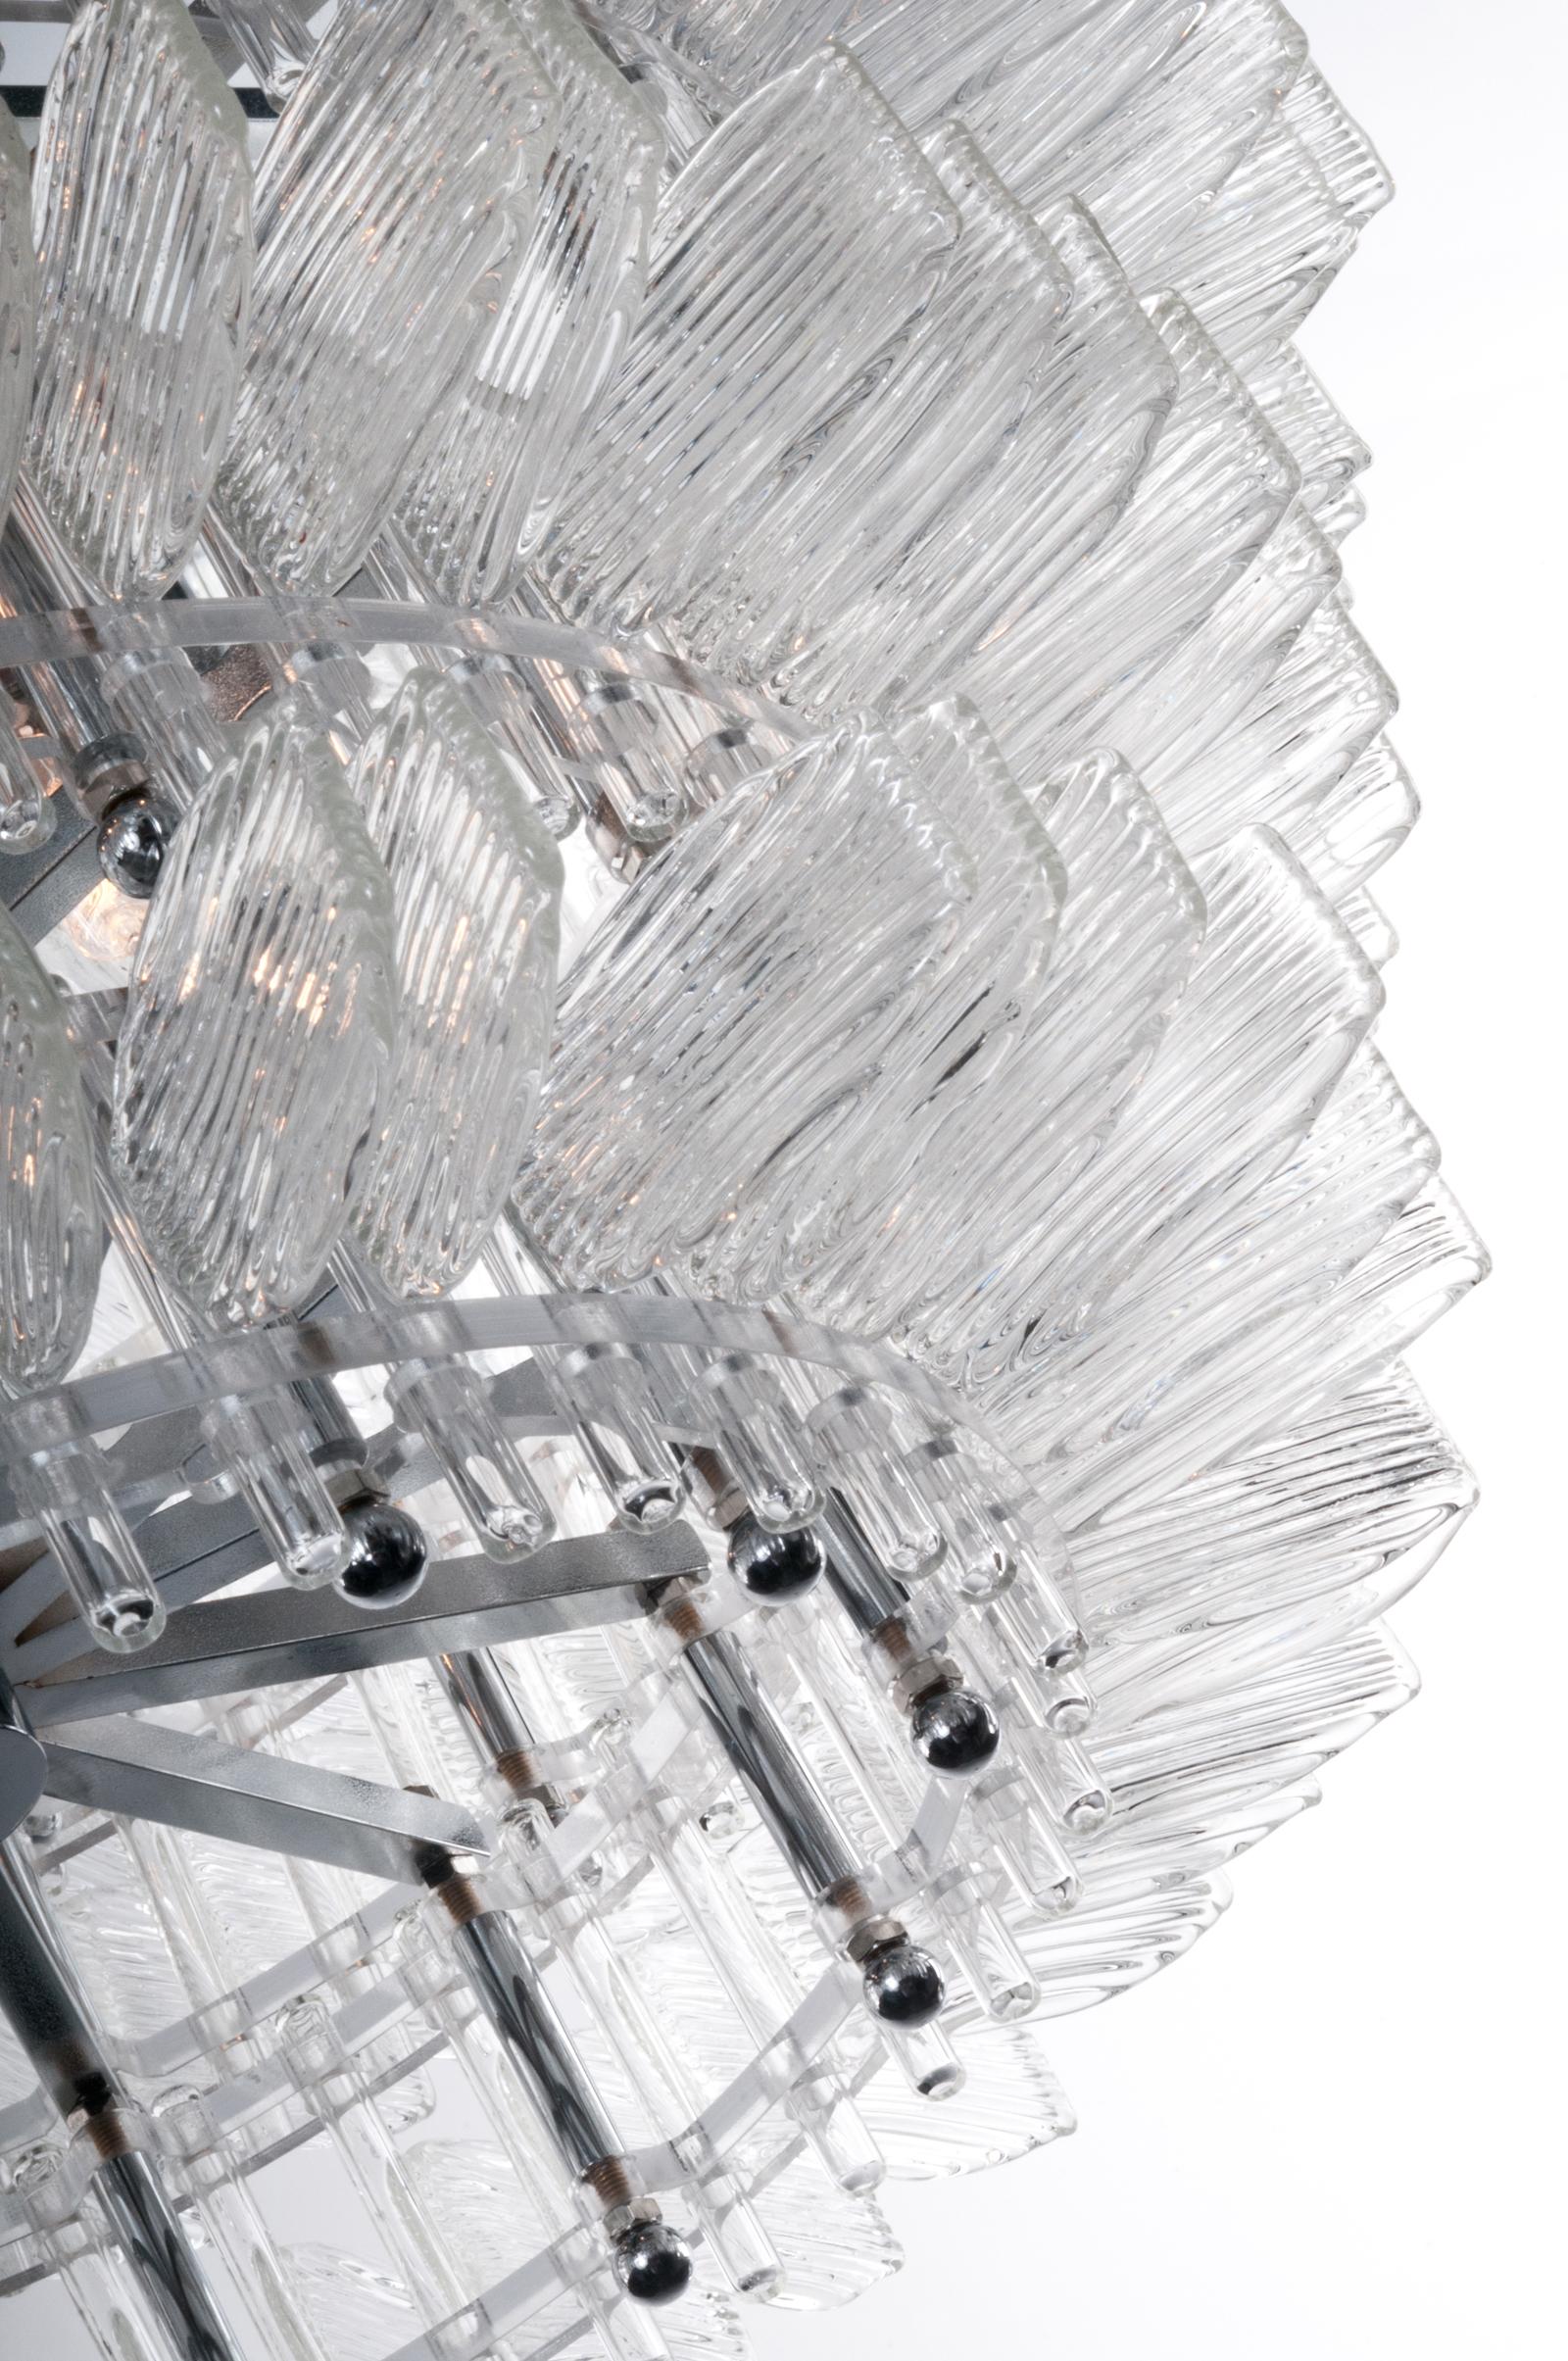 anemone-plafonnier-ceiling-veronese-tal-lancman-maurizio-galante-131.jpg